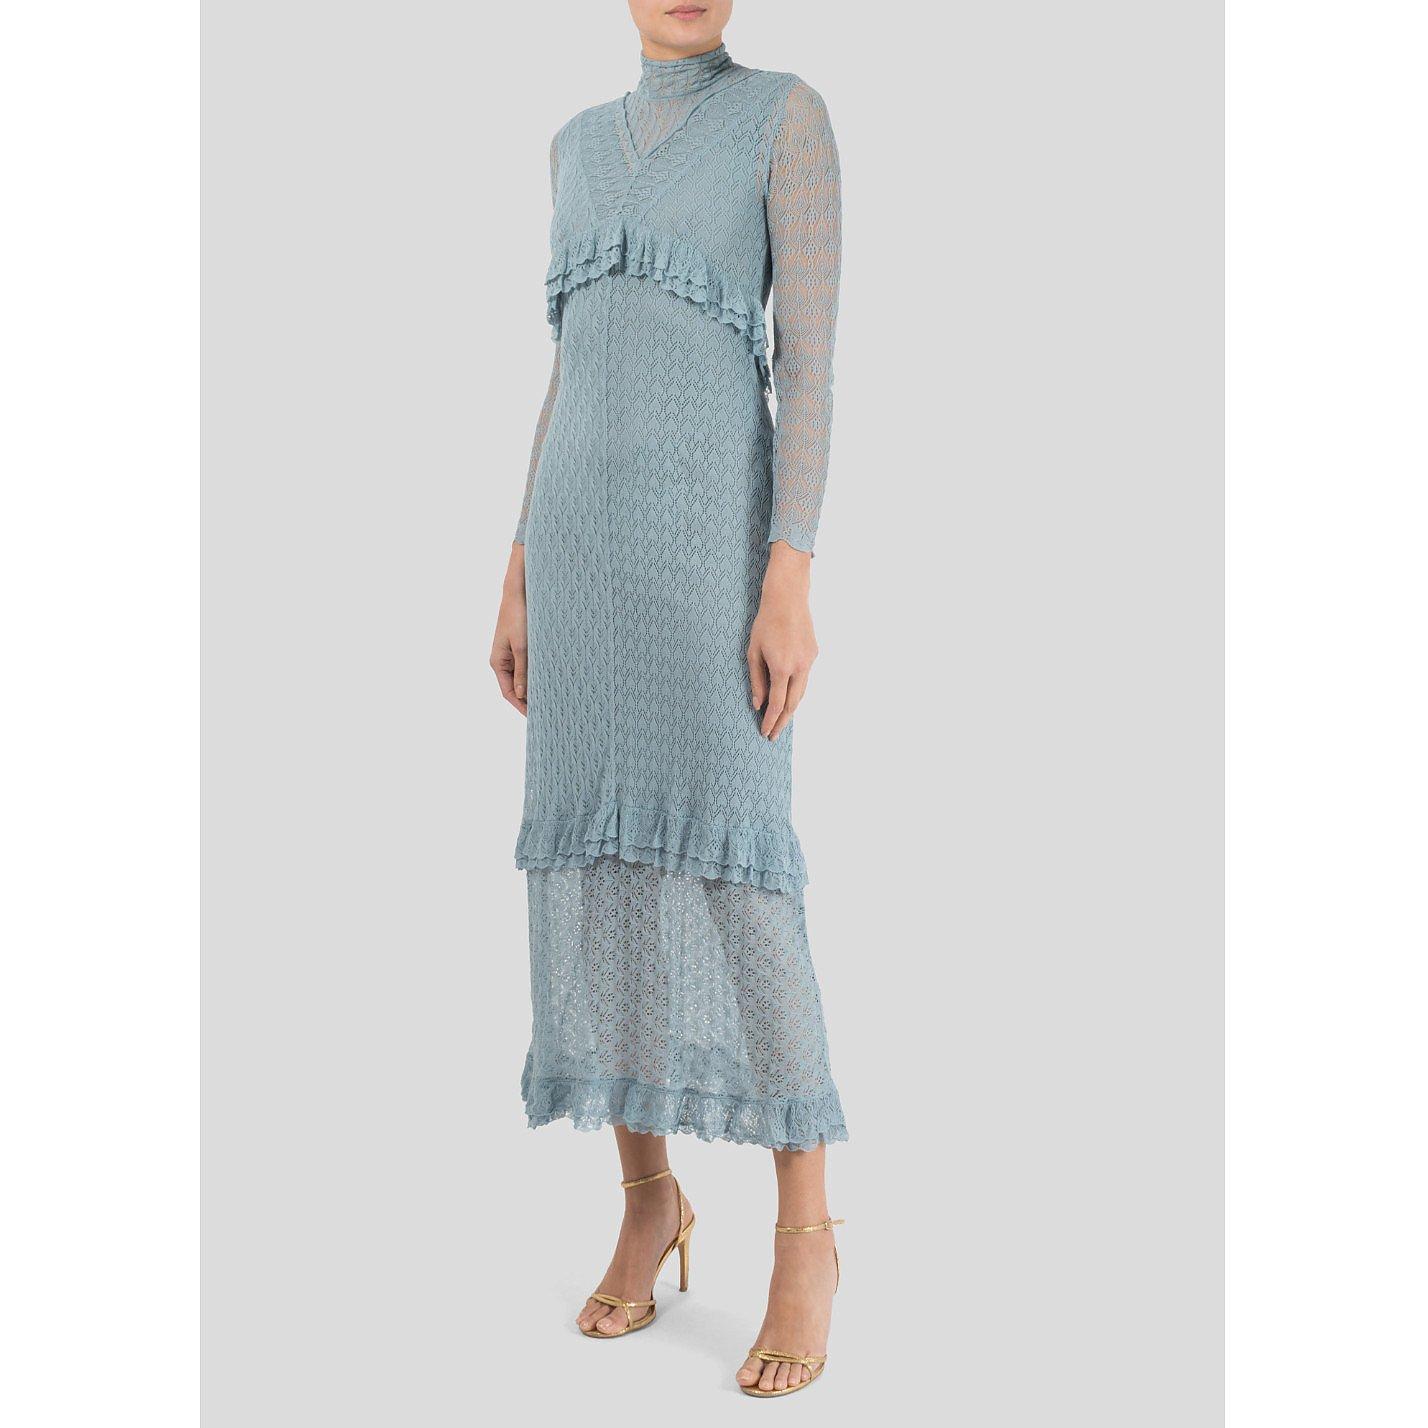 Alexa Chung Ruffled Stretch-Lace Midi Dress